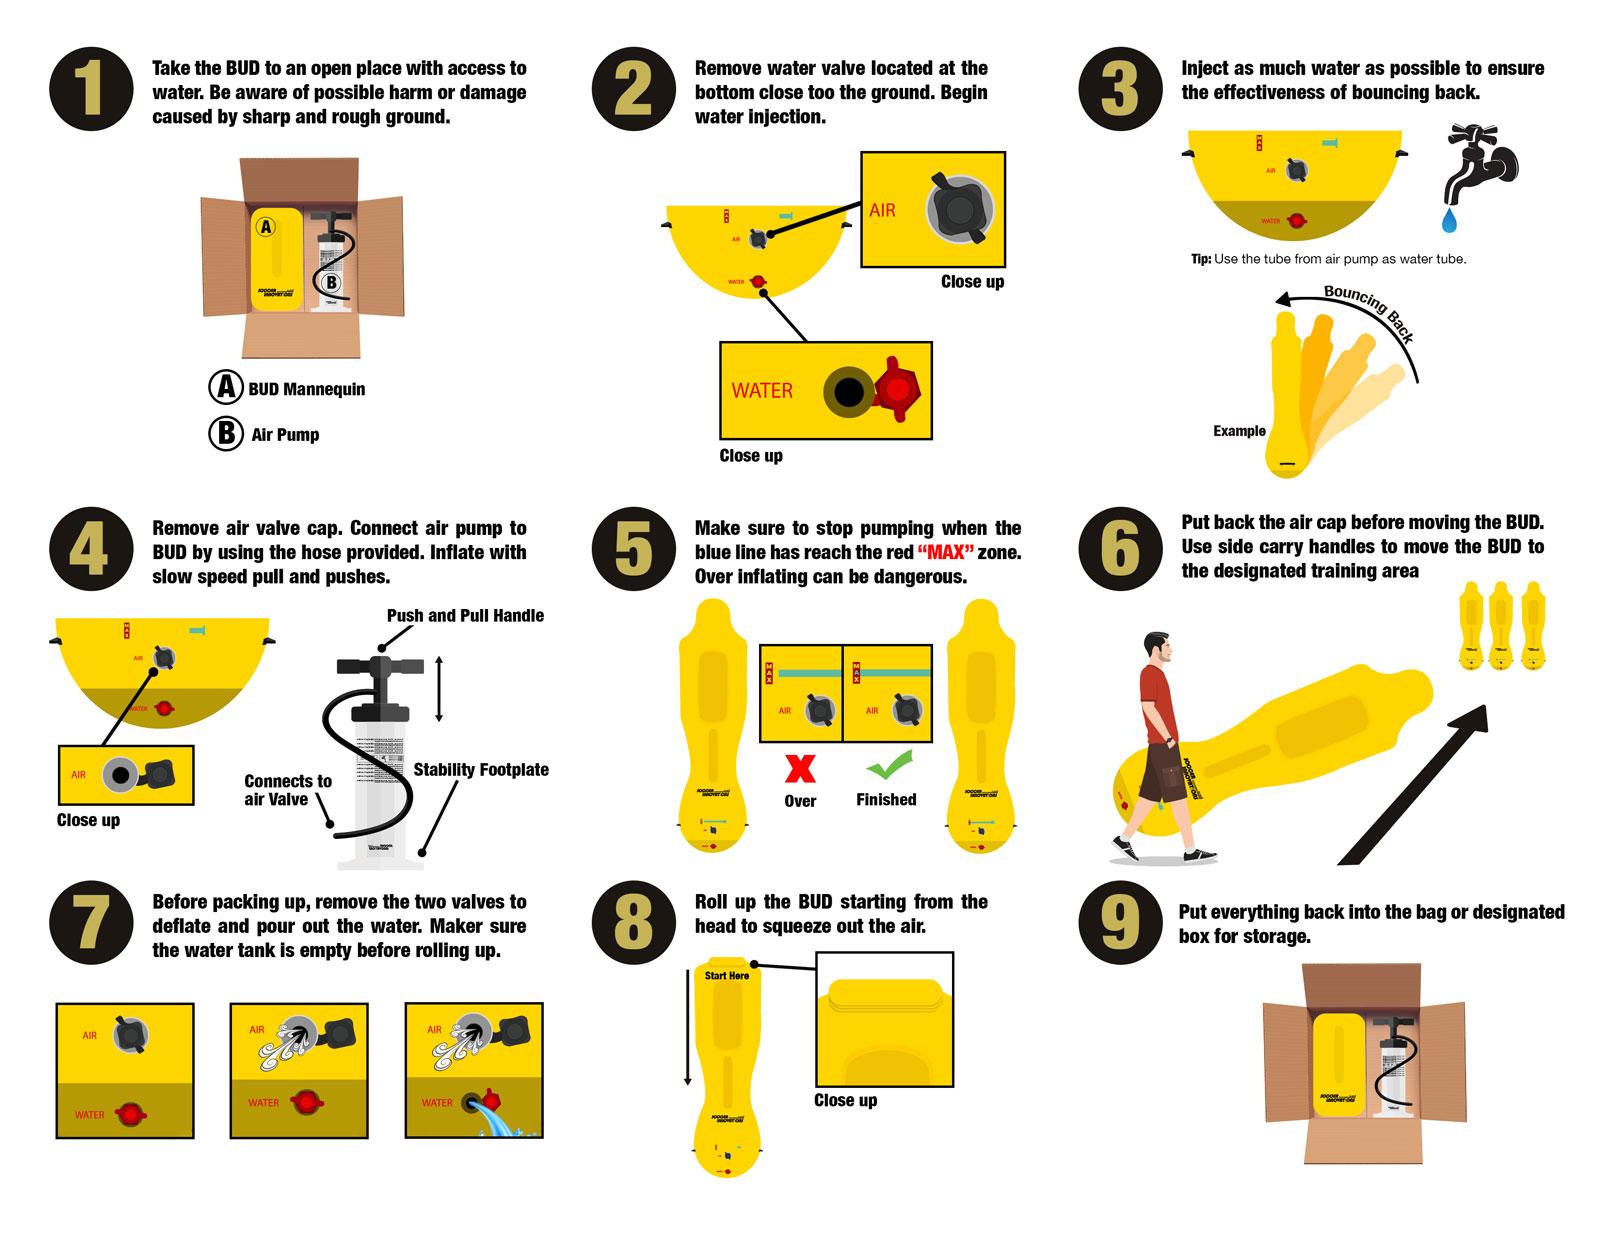 bud-instructions.jpg